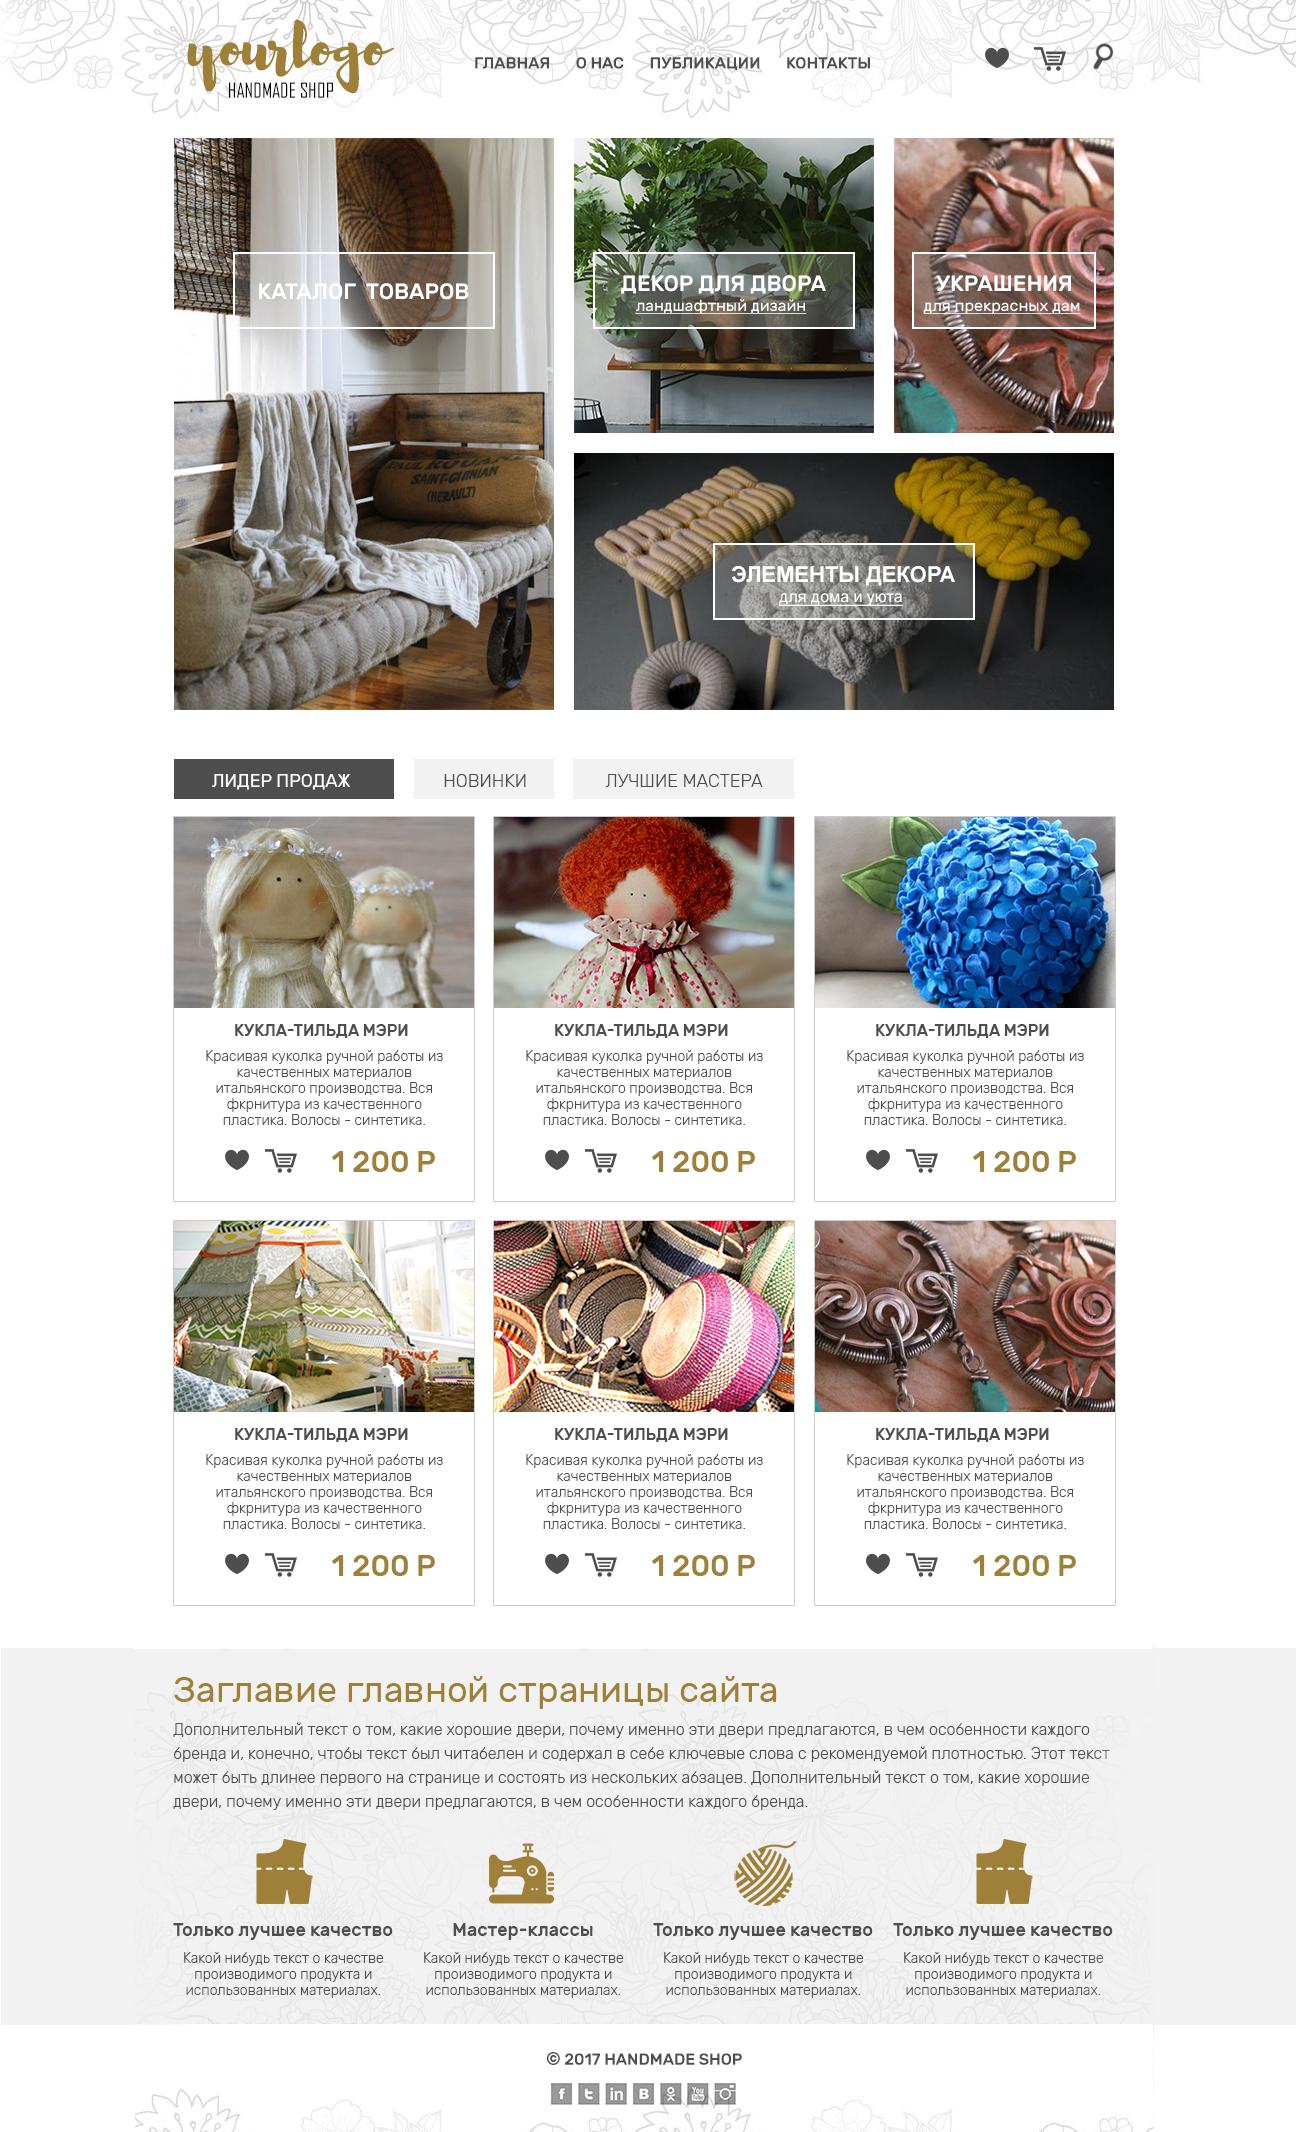 Разработка дизайна портала по тематике handmade. фото f_62458710fdb21a83.png